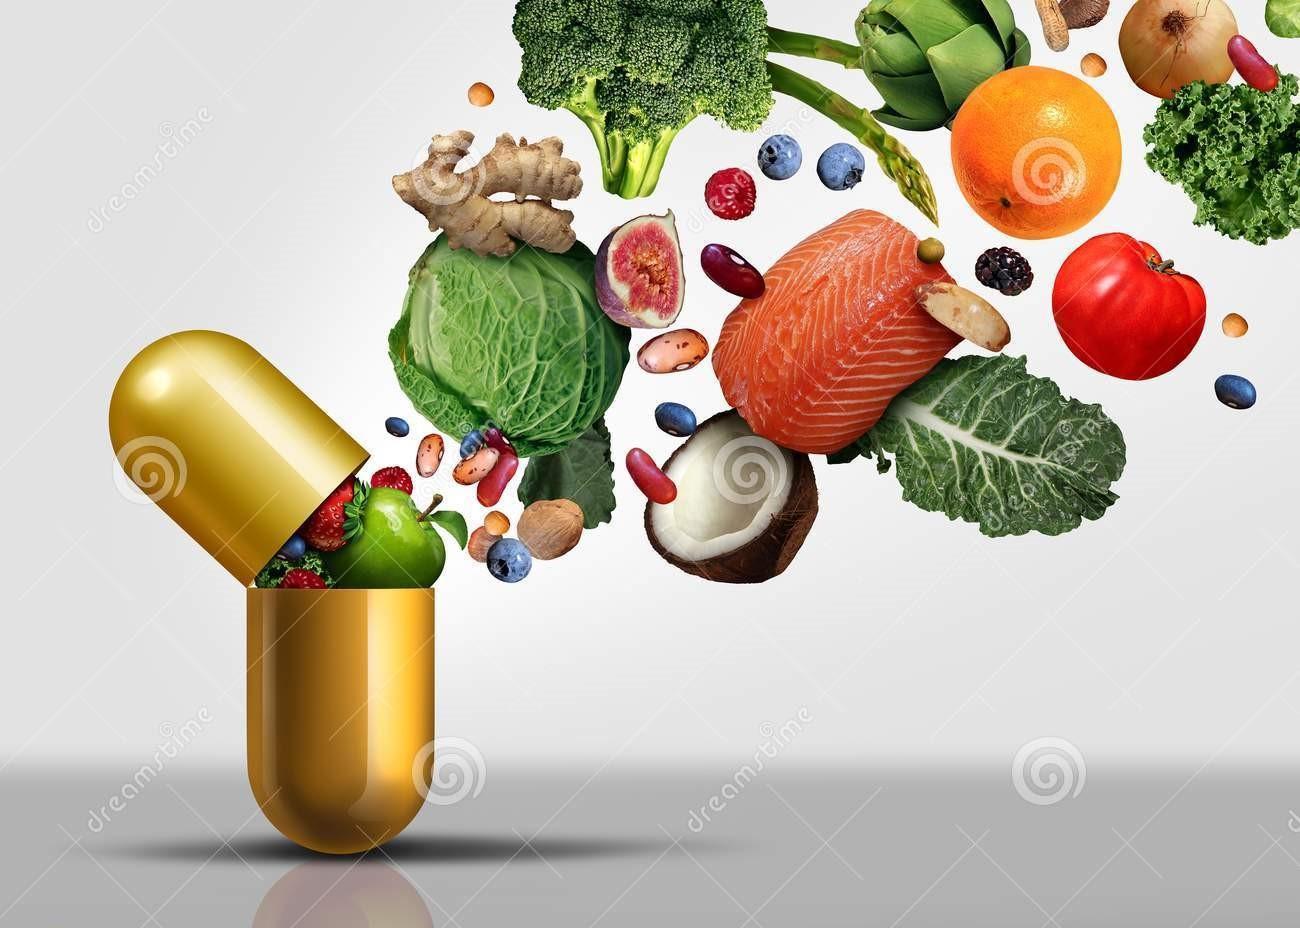 vitamins-supplements-as-capsule-fruit-vegetables-nuts-beans-inside-nutrient-pill-natural-medicine-health-treatment-d-110319057_1.jpg